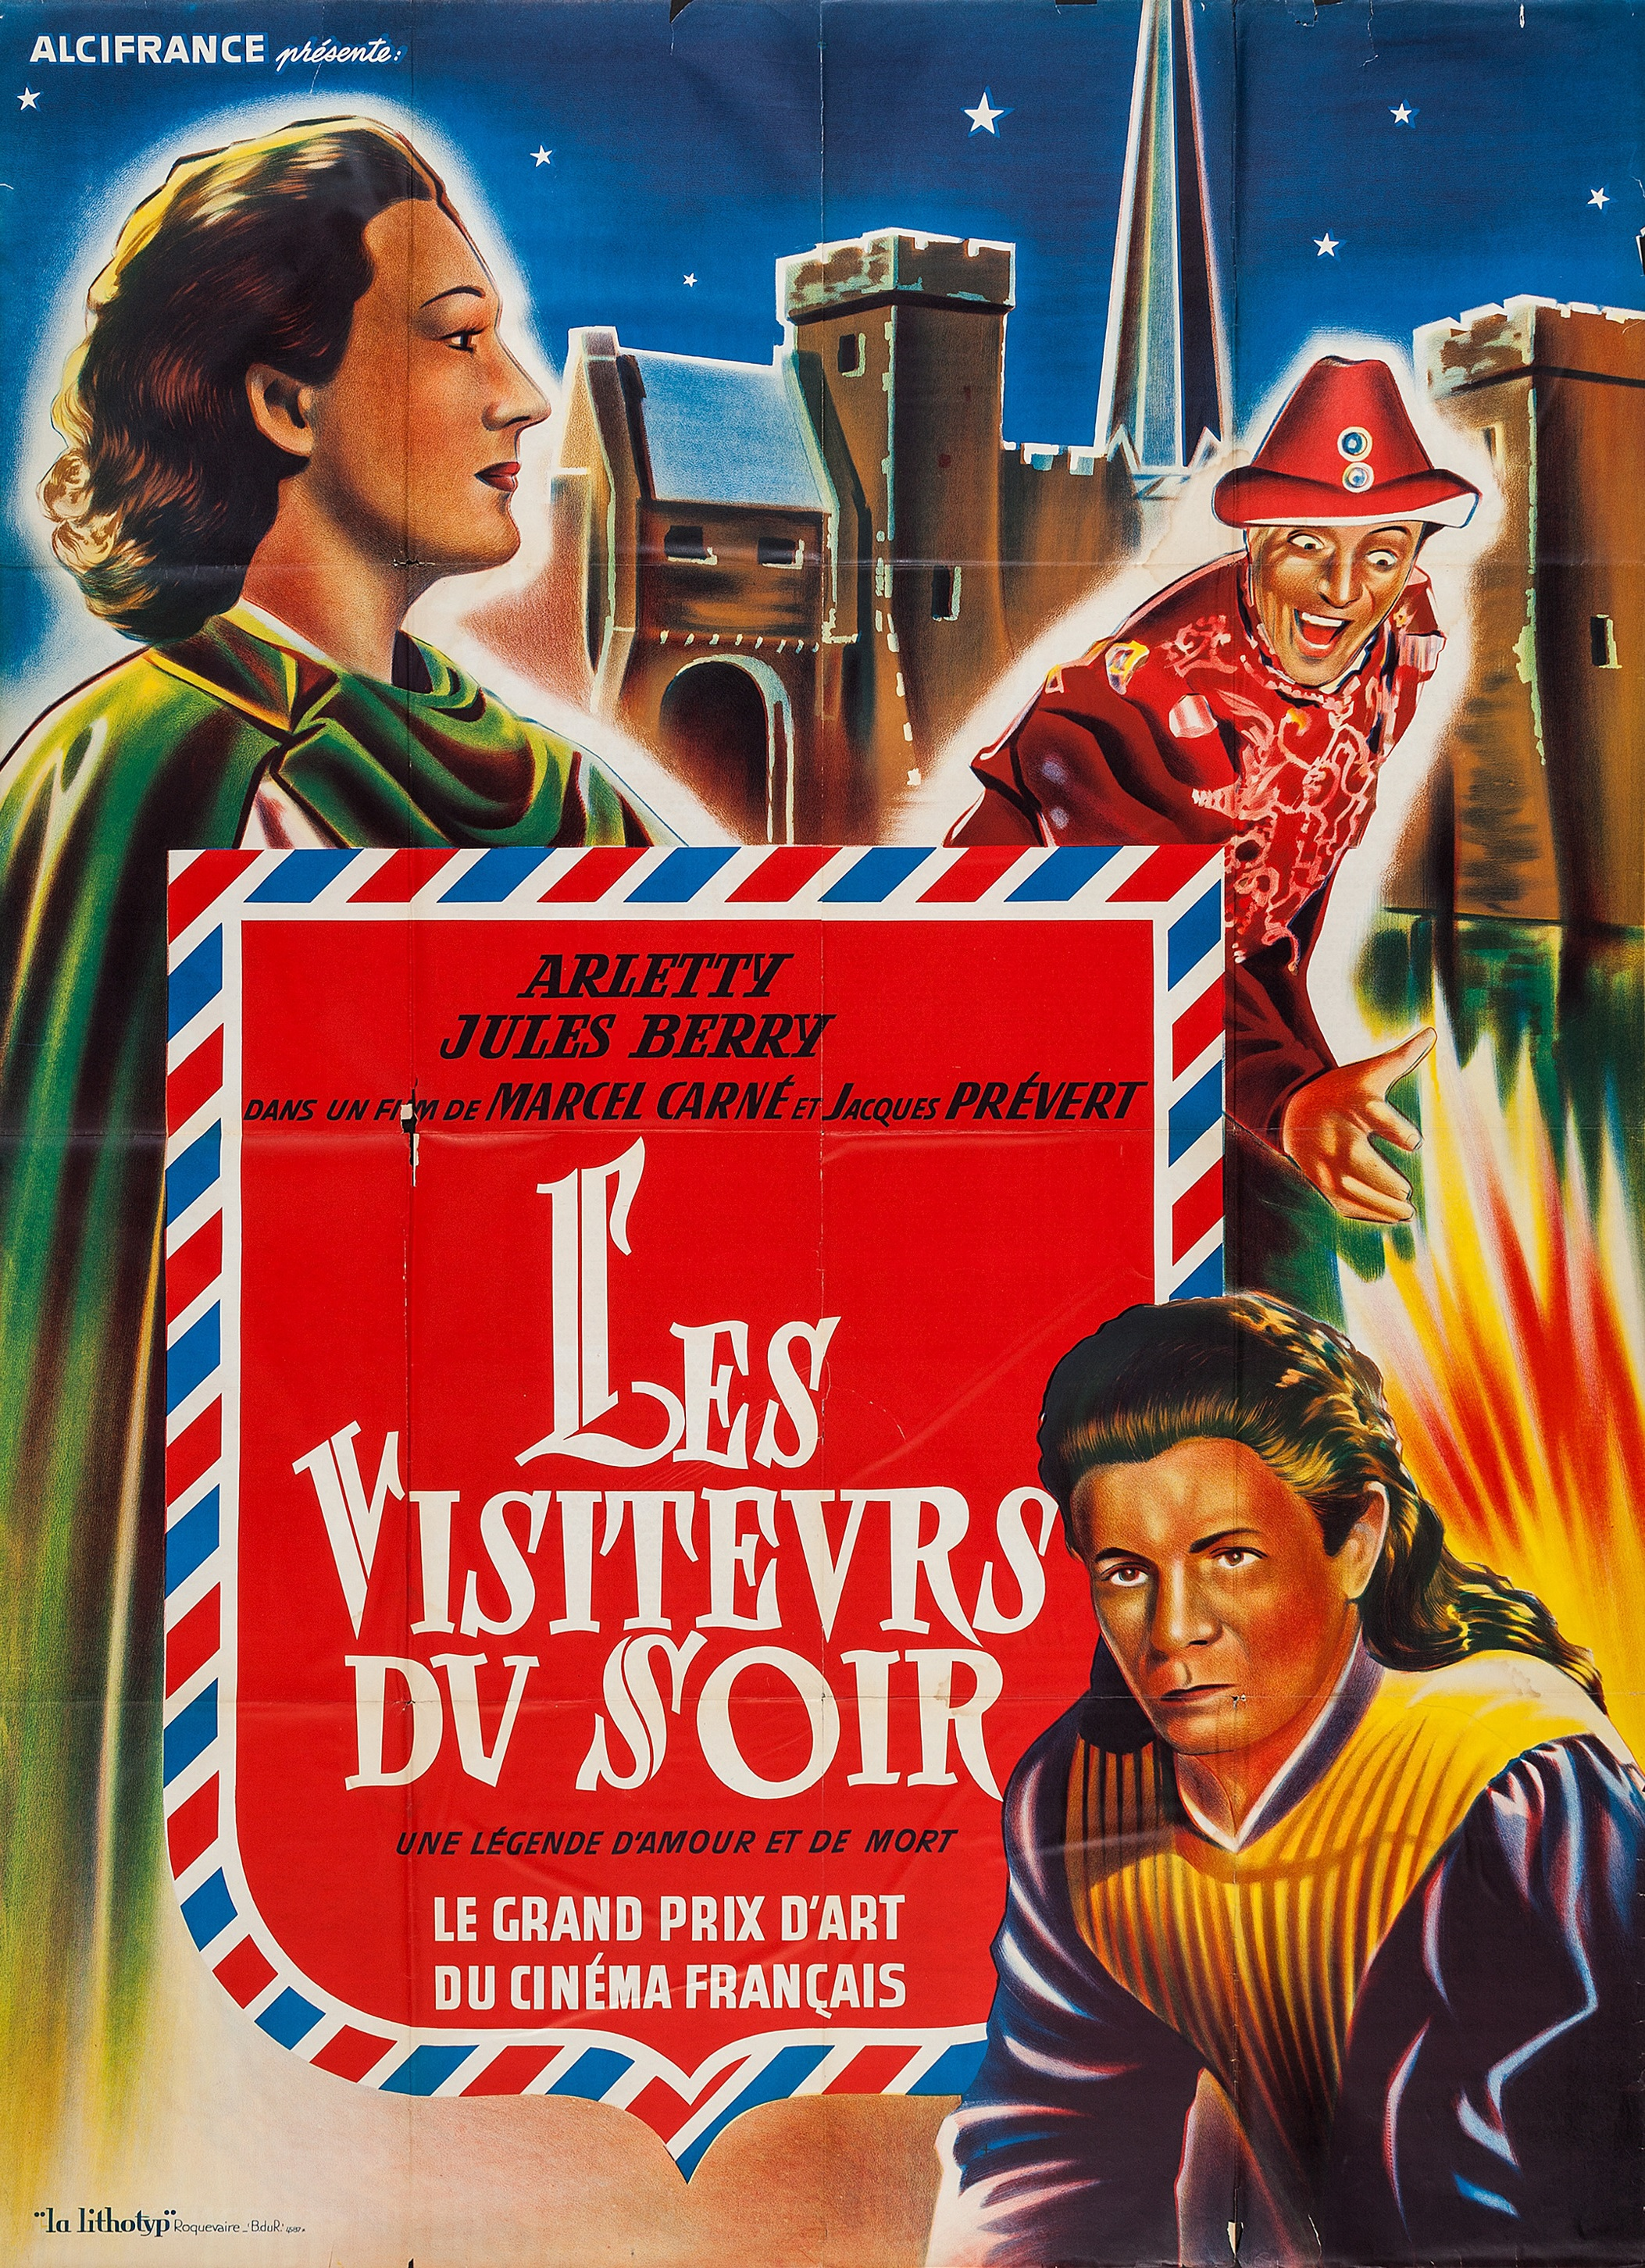 Les visiteurs du soir Marcel Carne vintage movie poster